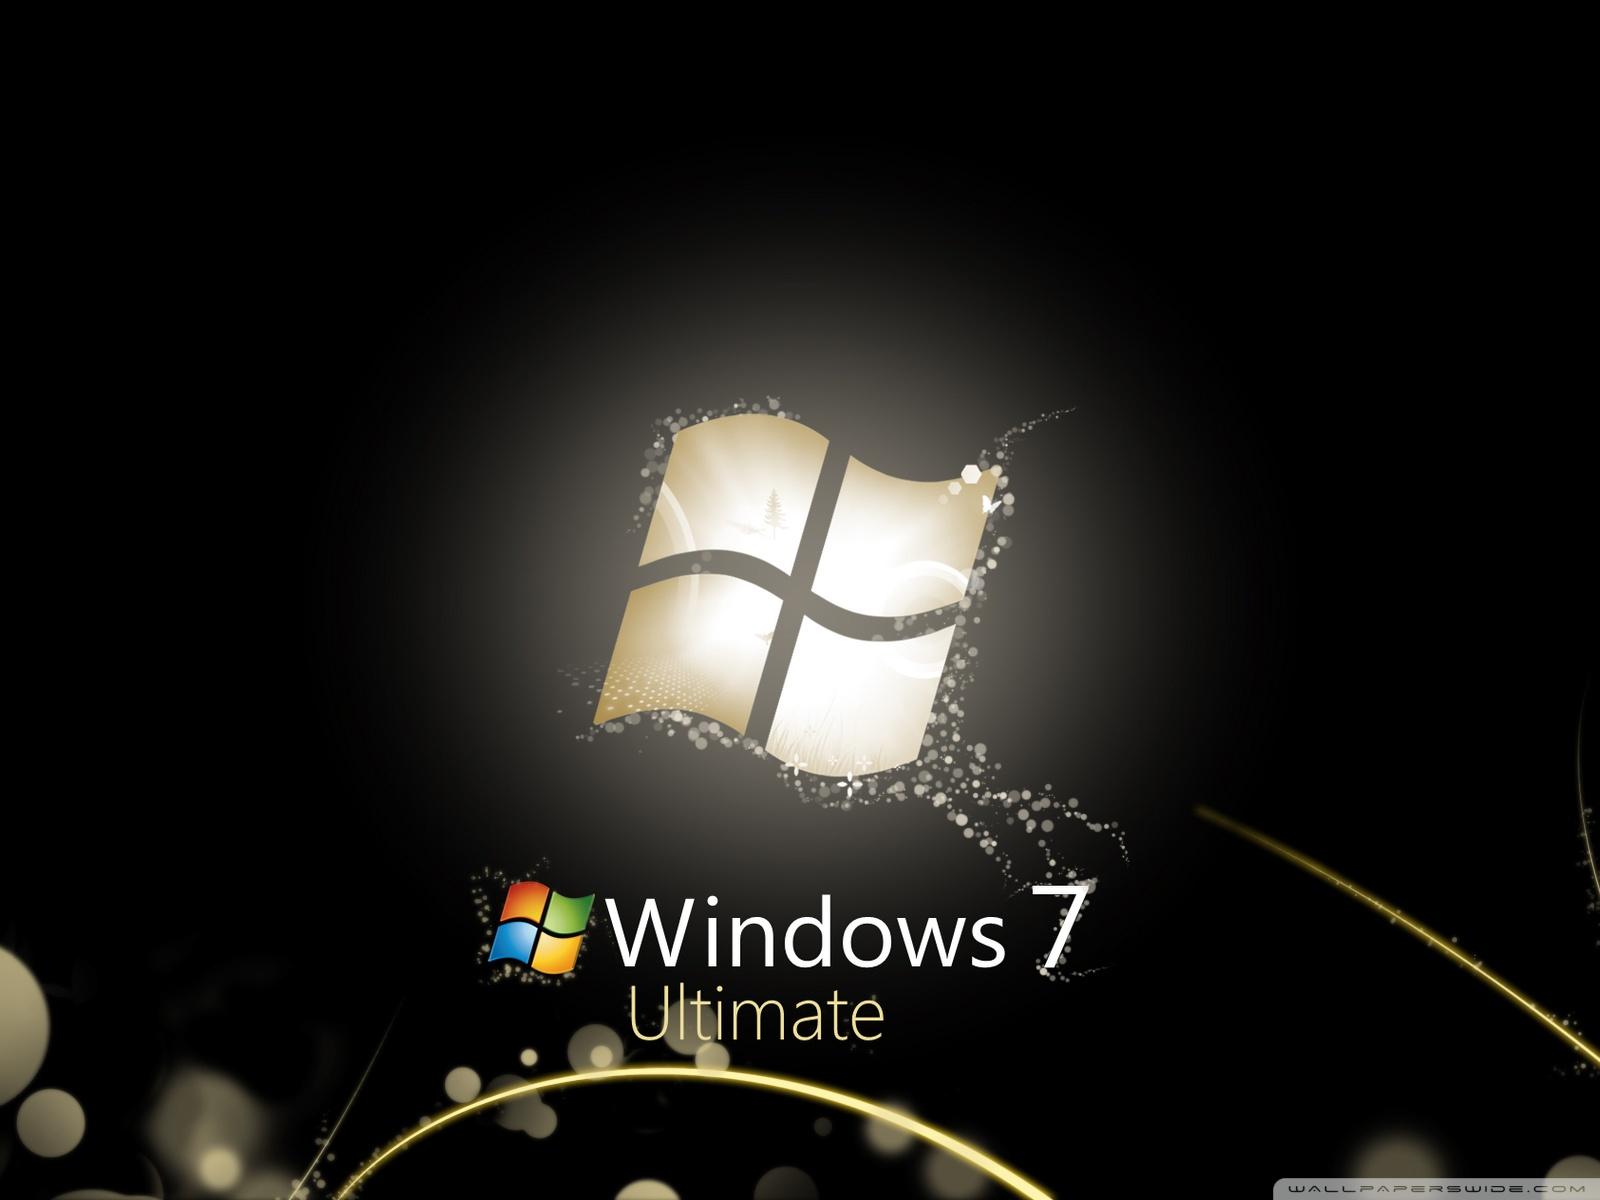 Standard   Windows 7 Wallpaper Hd 736004   HD Wallpaper Download 1600x1200